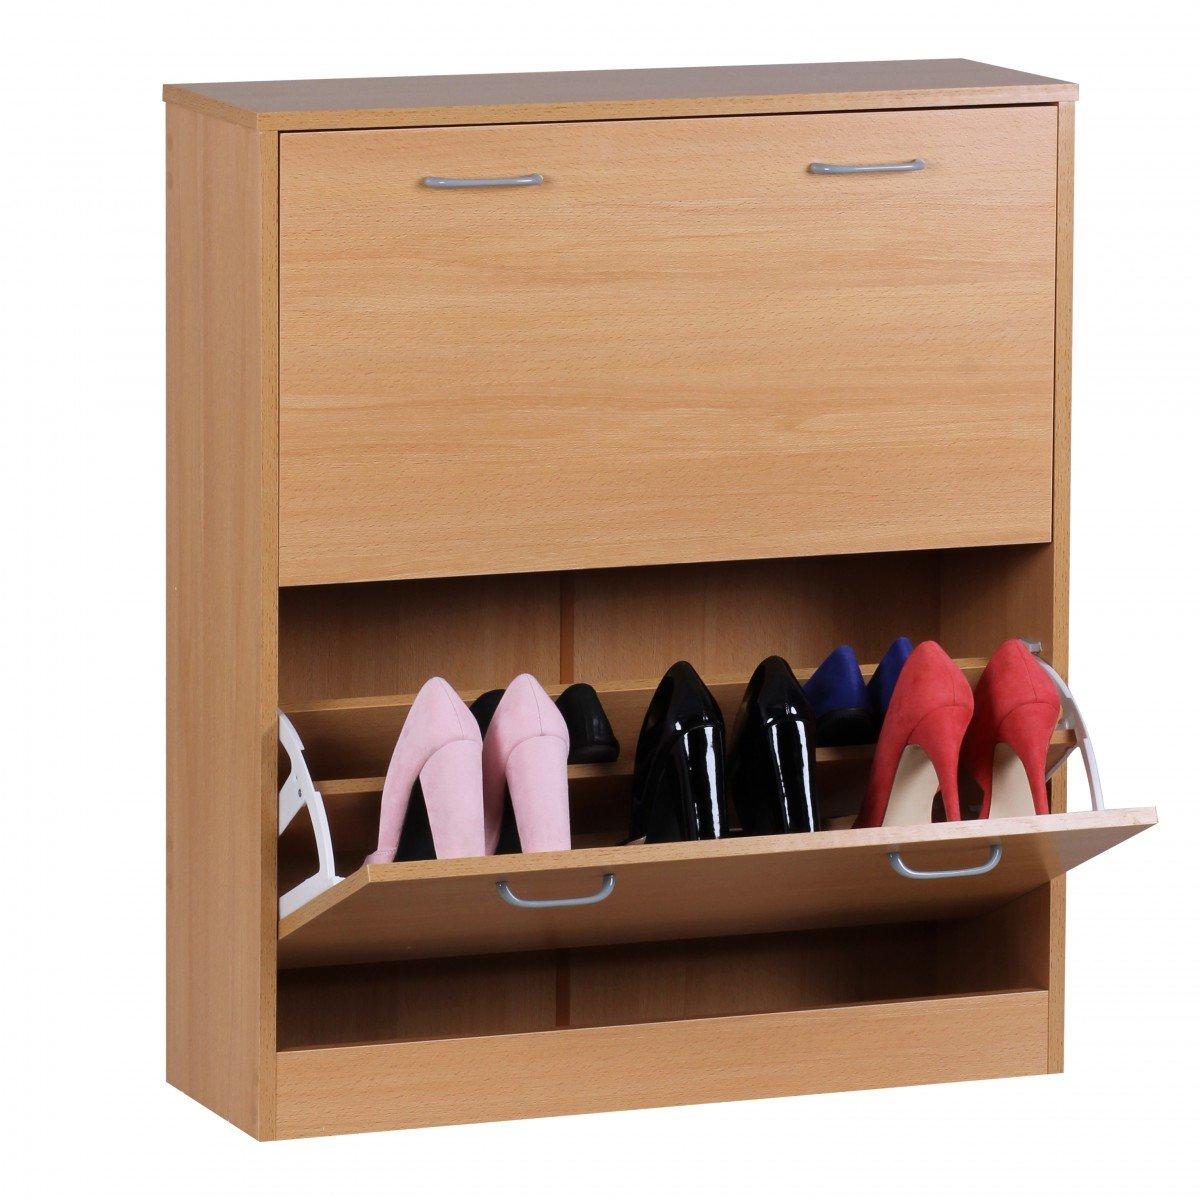 Wohnling Schuhkipper Sarah Kommode schmal Schuhschrank zu Cabinet Schuhkommode Flur Holz, 75 cm breit 87 cm hoch 24 cm tief 20 paar Schuhe Doppelreihe geschlossen Garderobe 2 Klappen doppelt, buche